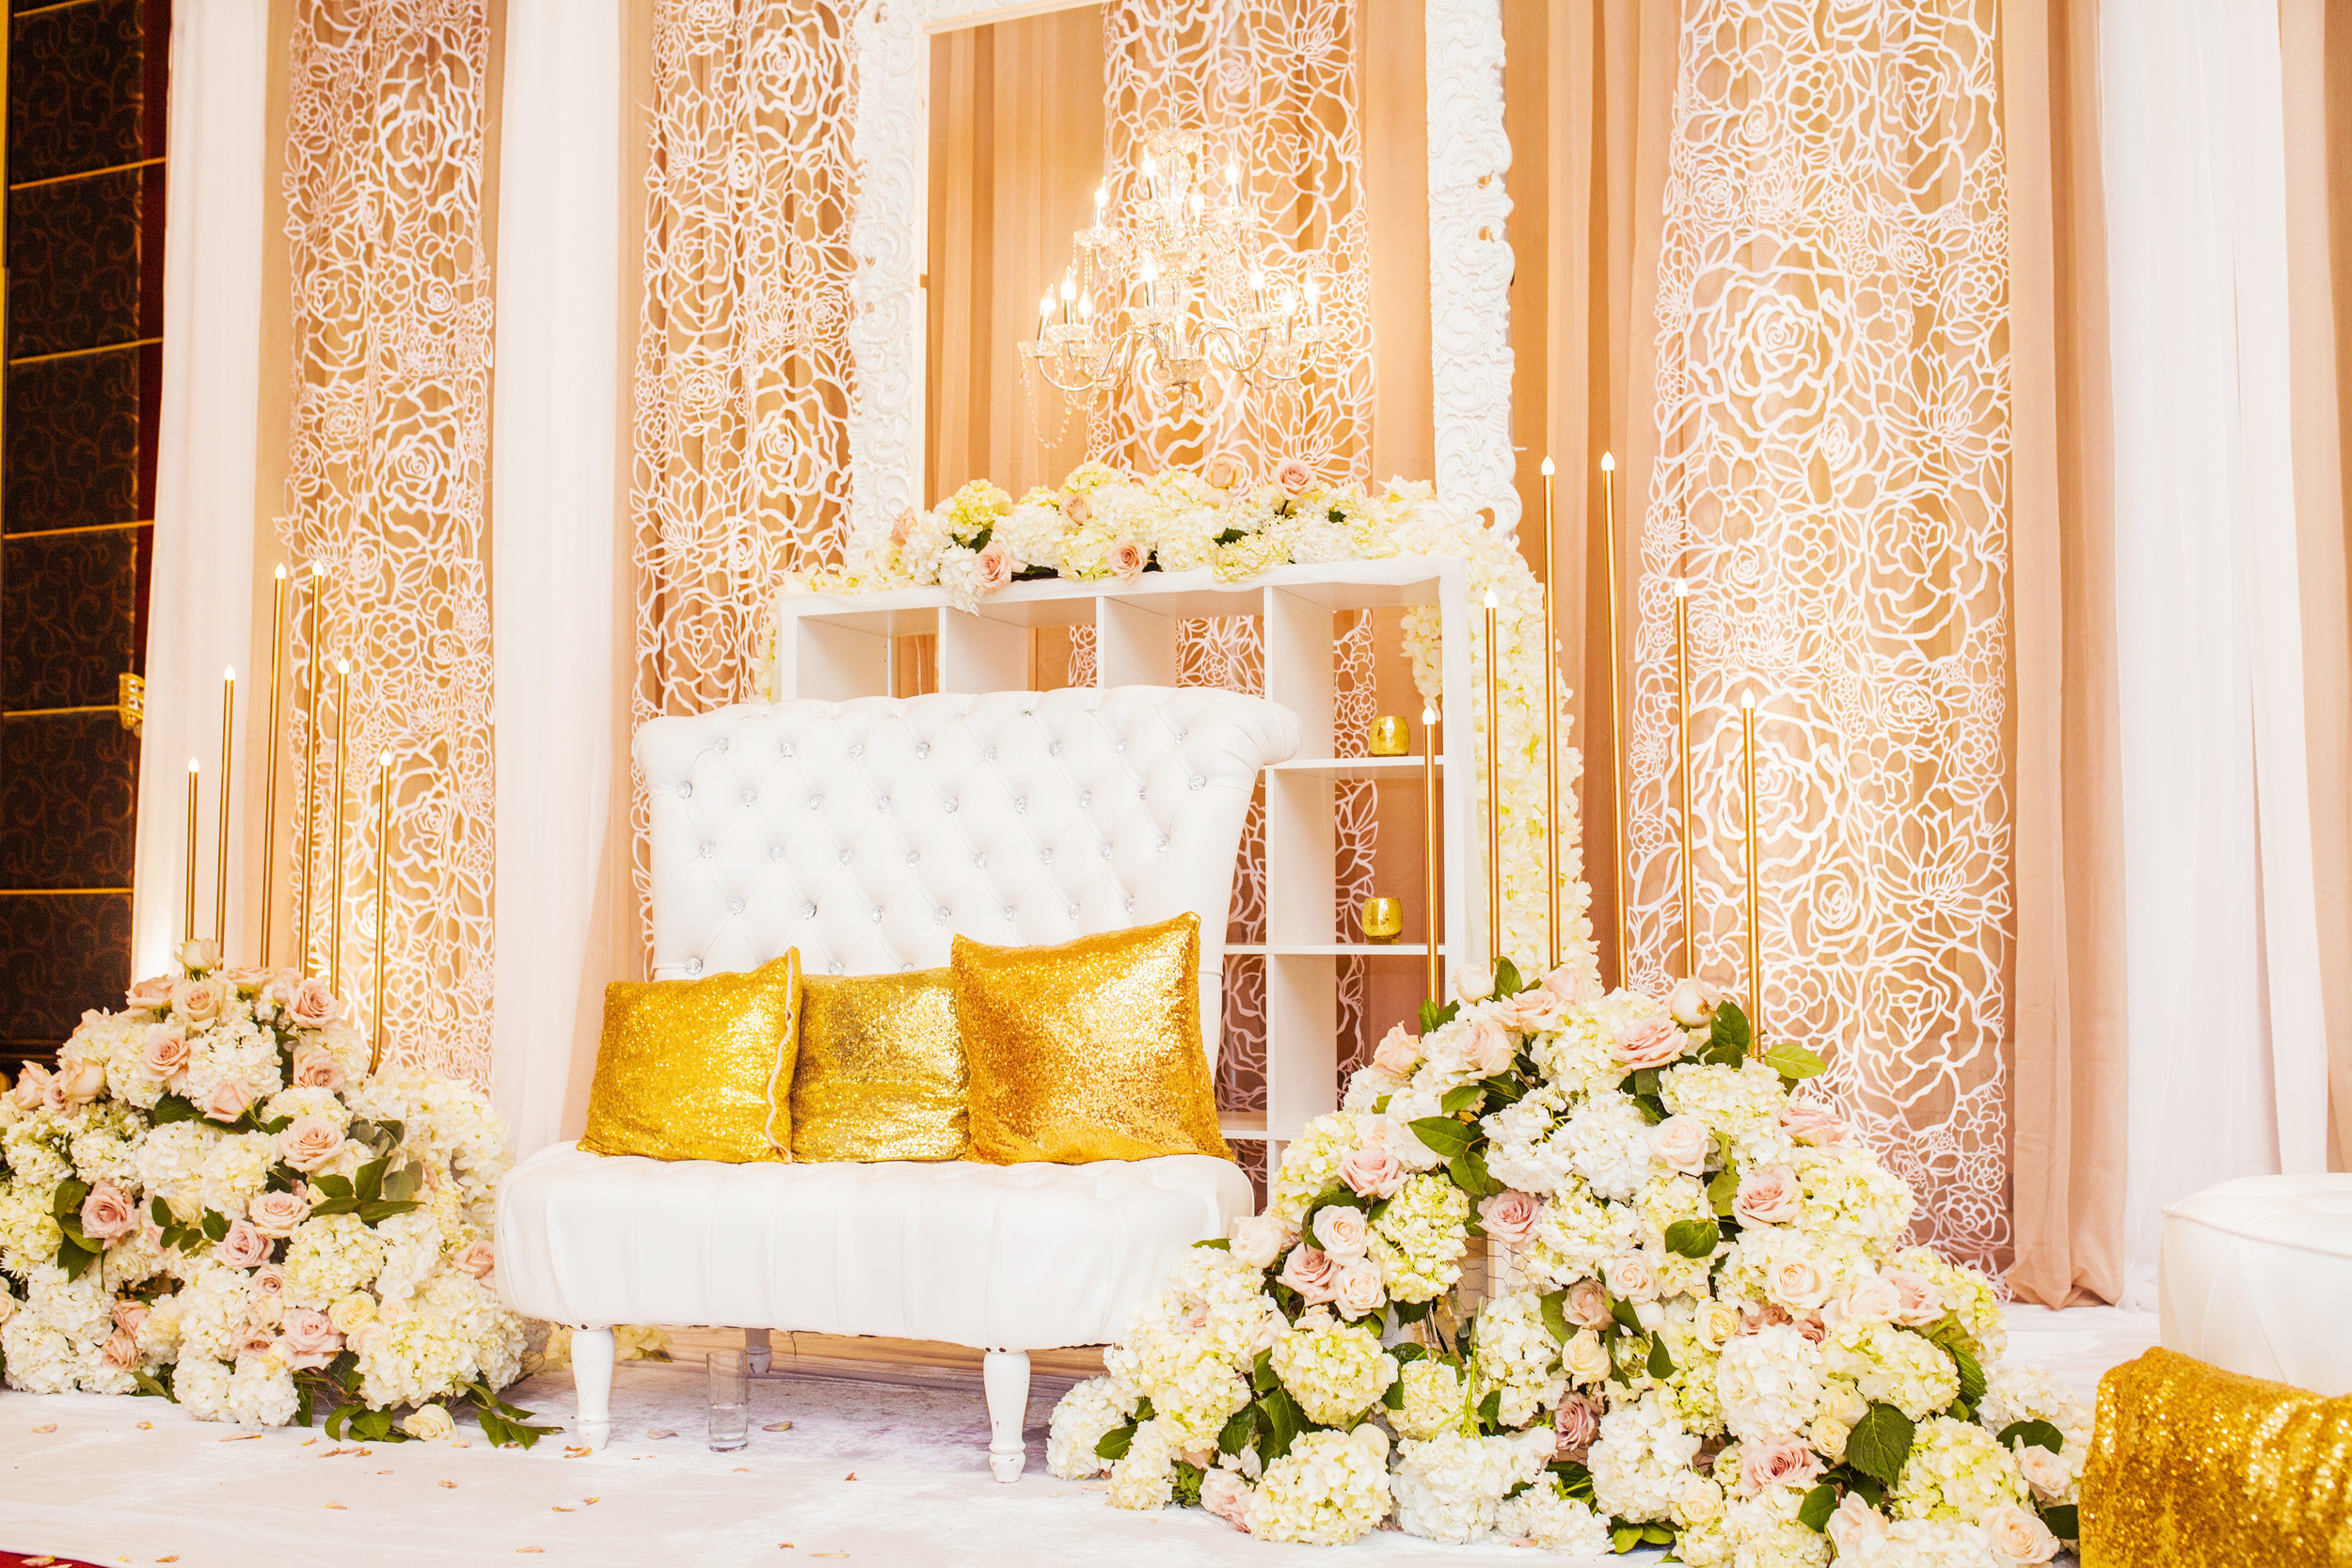 Karimah Gheddai Somali Weddings Toronto Florals Wedding decor white flowers Gold Decor Markham Convention Centre